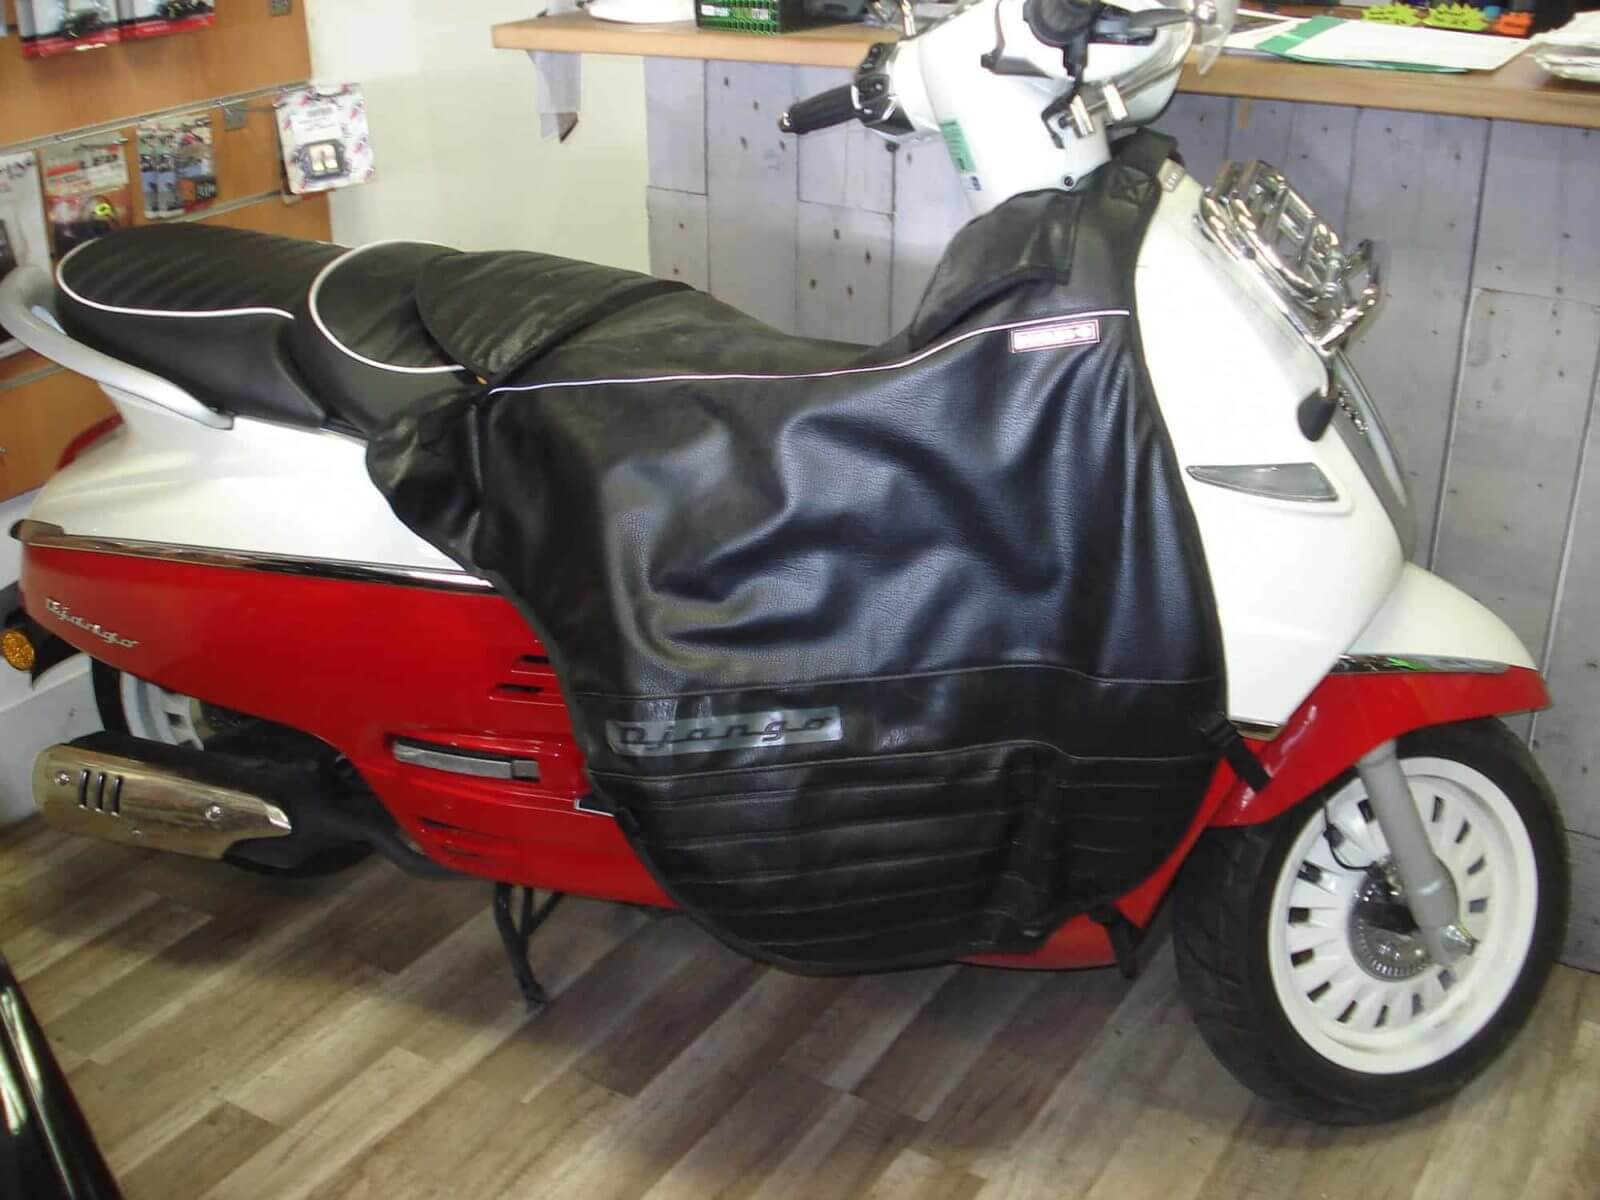 Peugeot Django 125 – 3800€